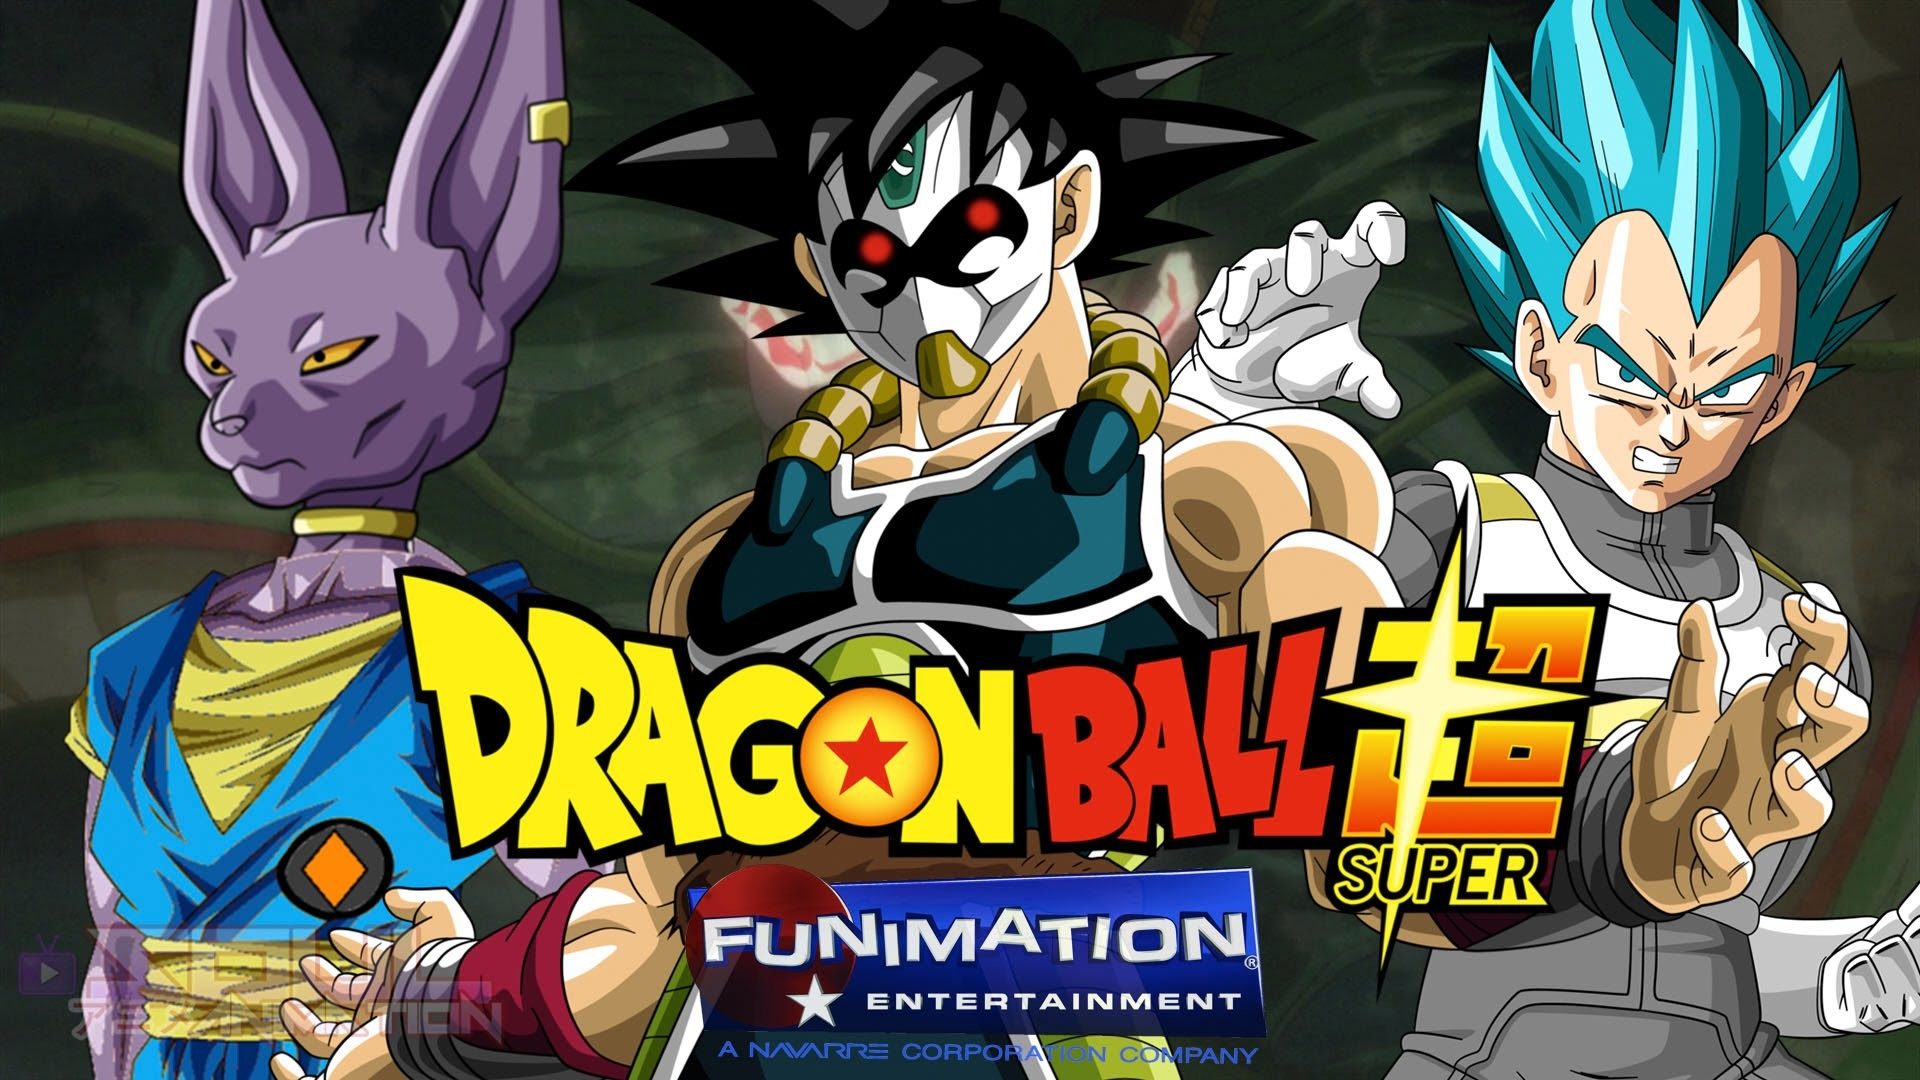 Bardock Returns Dragon Ball Super 2015 Anime : The Original Super Saiyan  God – YouTube